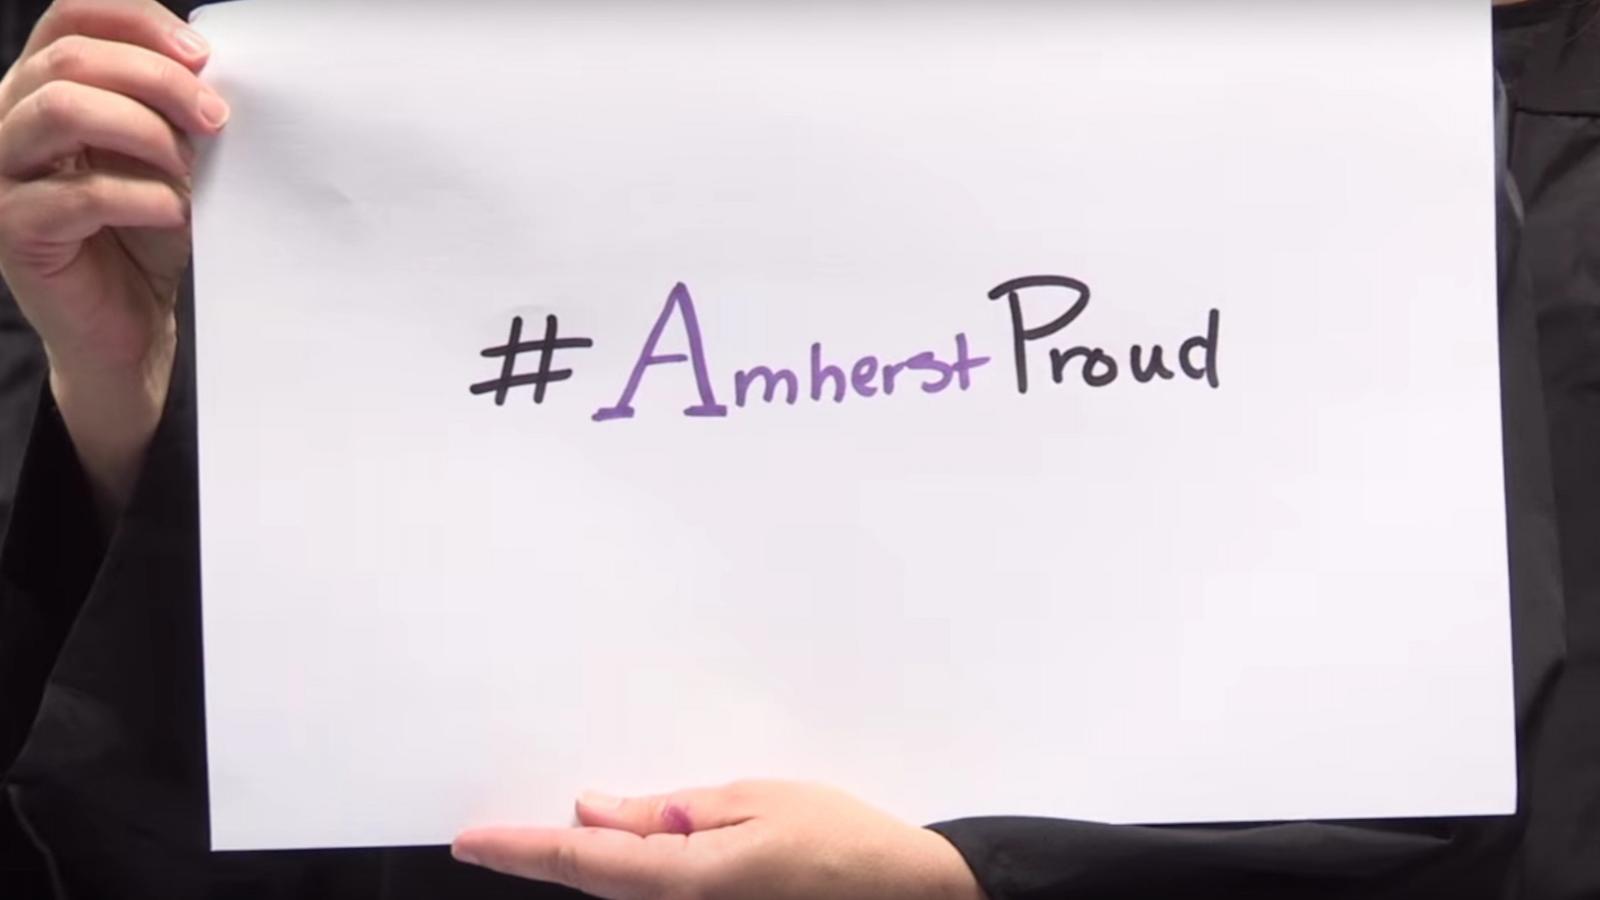 #AmherstProud